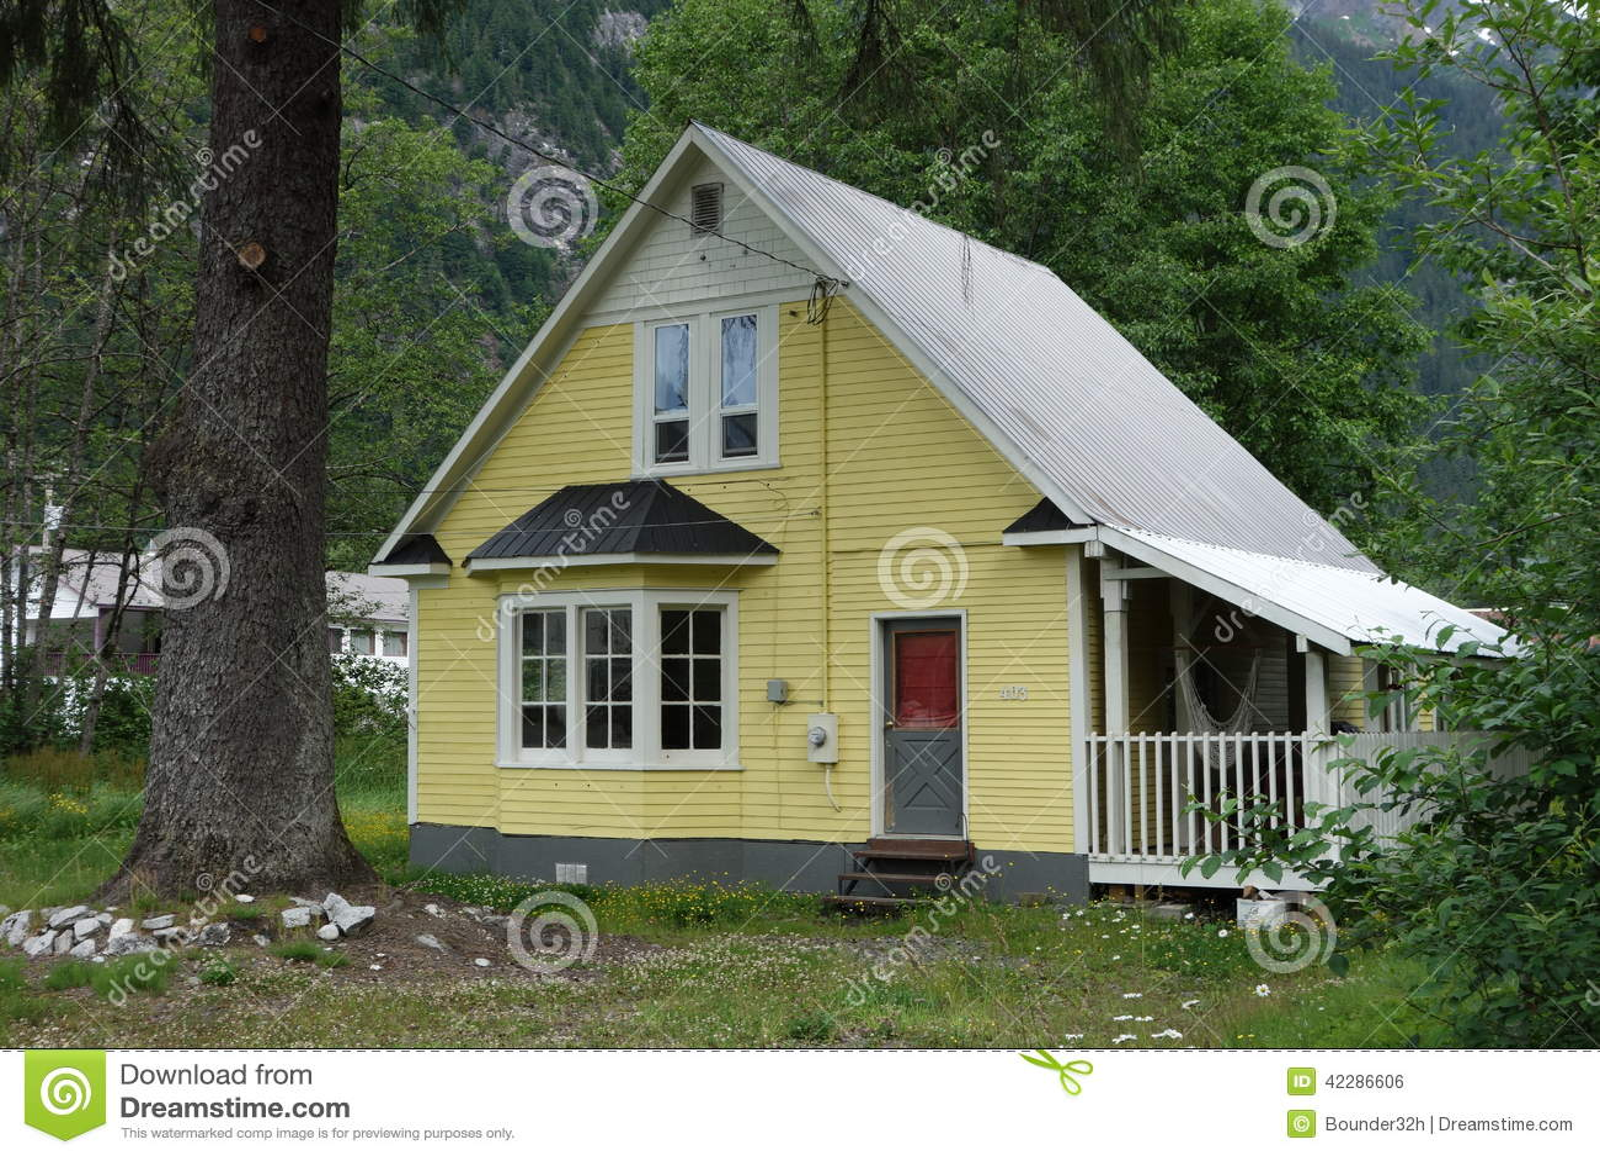 A simple house at stewart canada